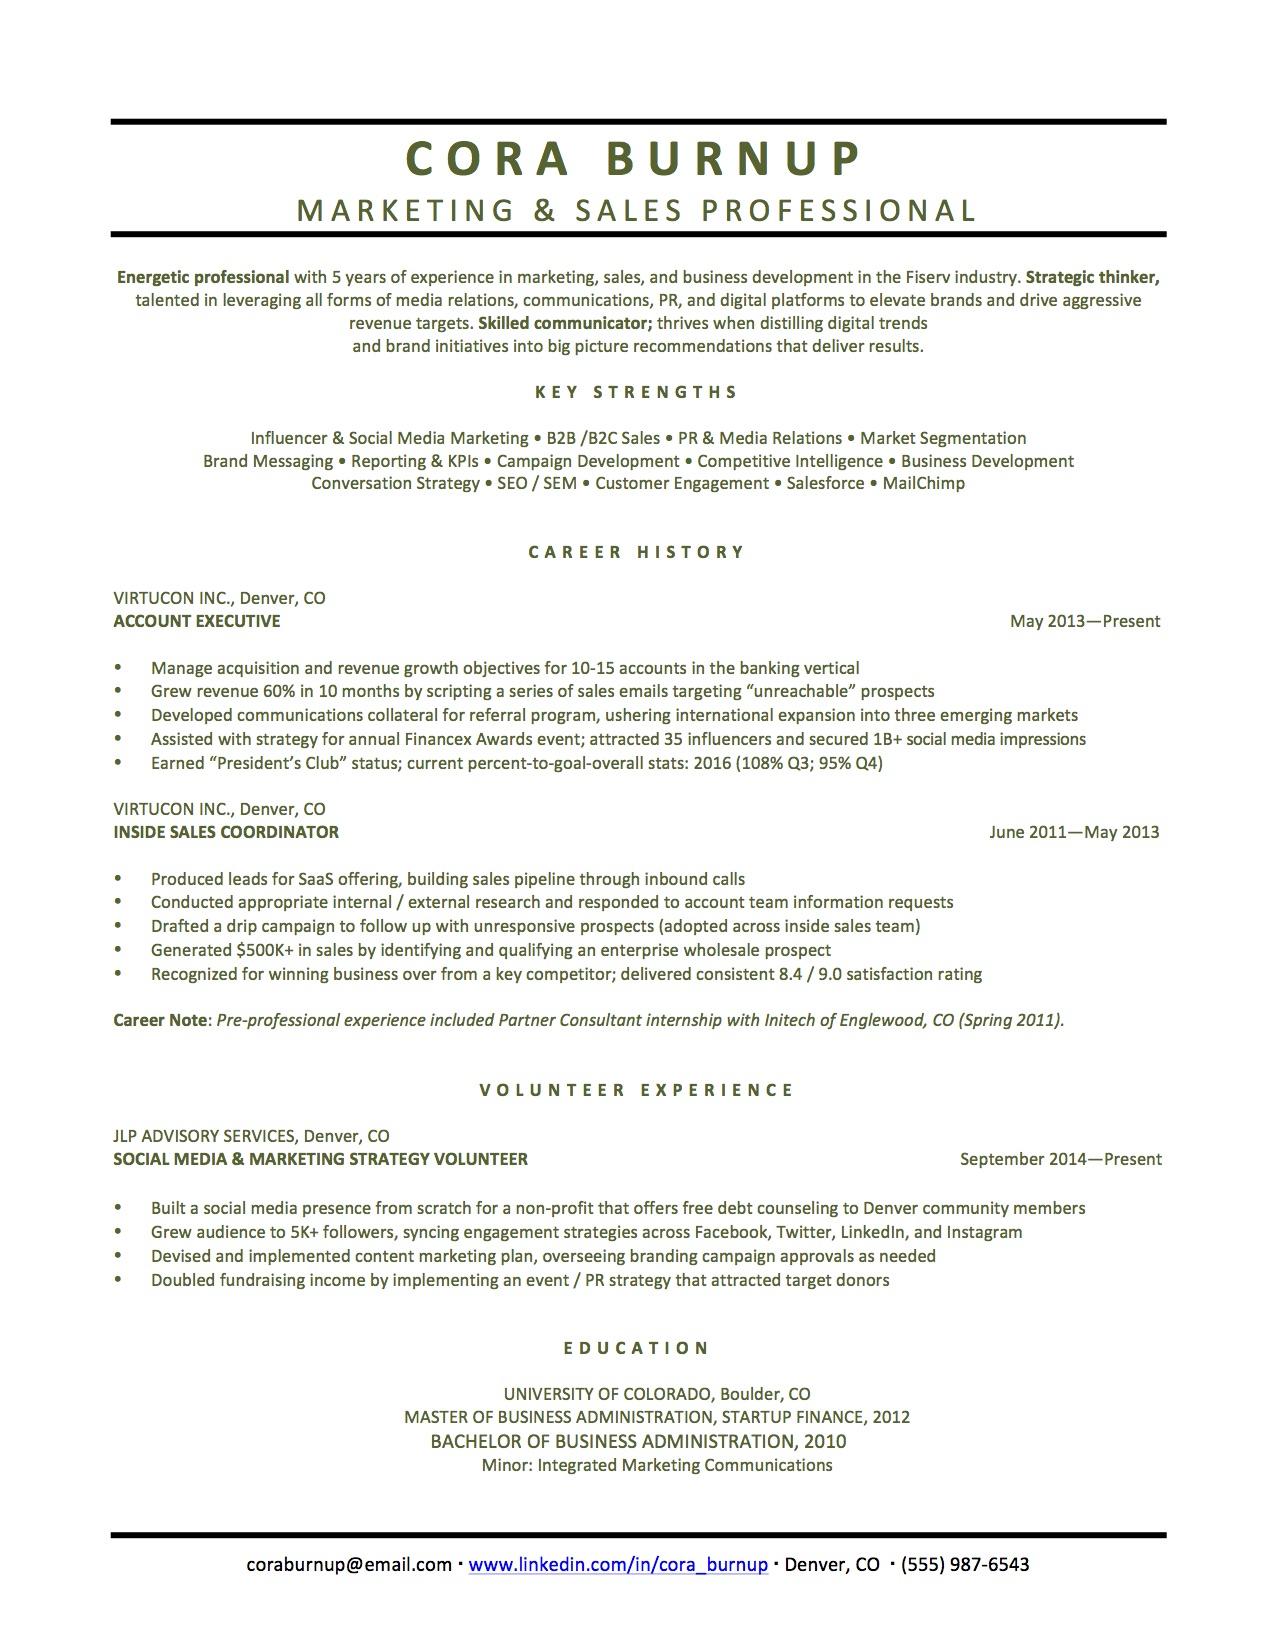 Career Summary Resume Example Resume For A Career Change Sample Distinctive  Documents Hertogenboschalstublieft  Example Of Career Summary